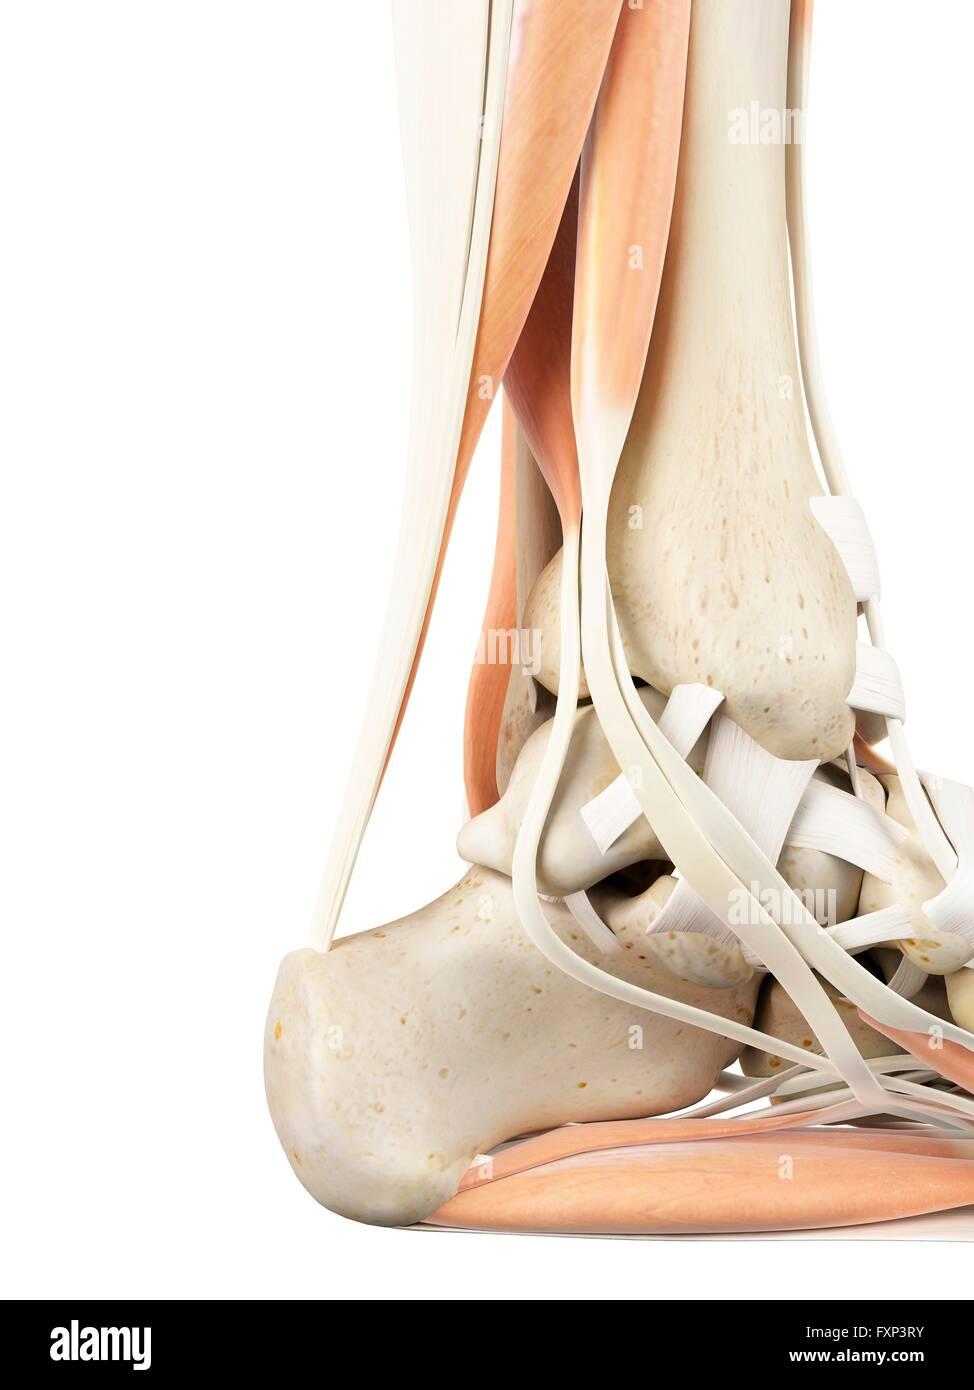 Human Heel Anatomy Stockfotos & Human Heel Anatomy Bilder - Alamy